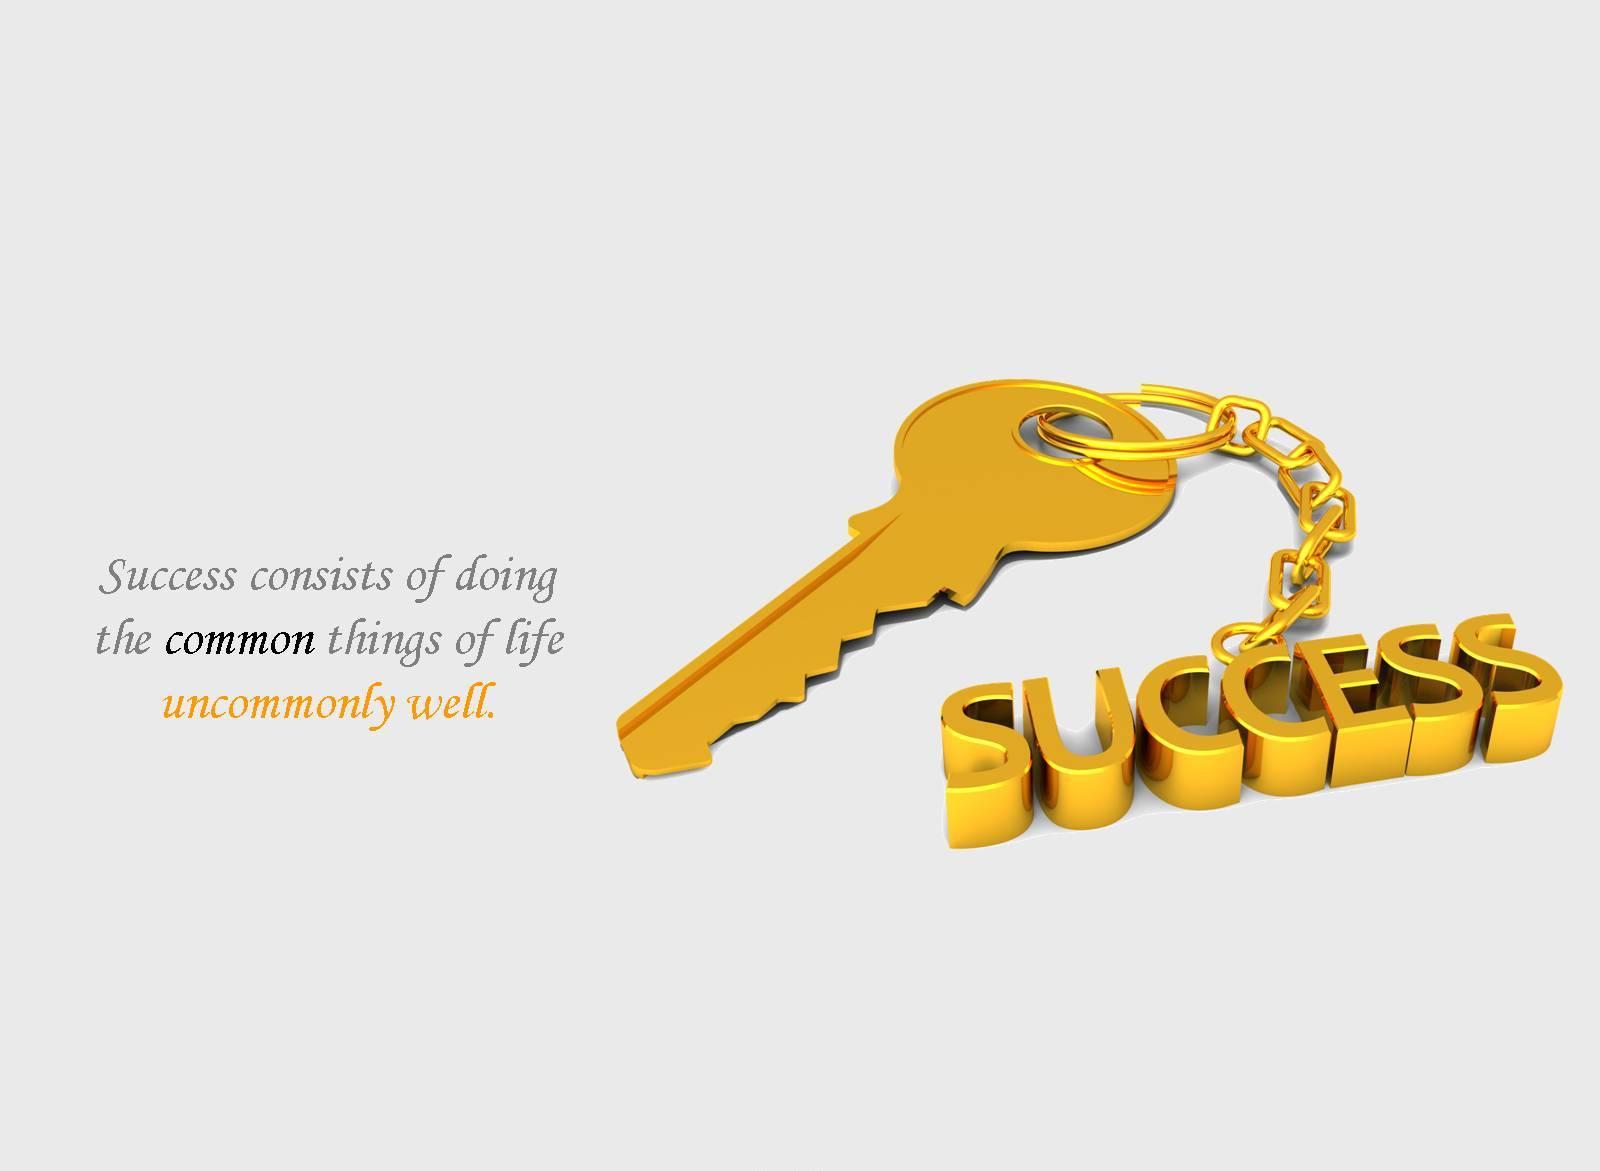 Motivational Wallpaper On Success : Success Consists Of Doing